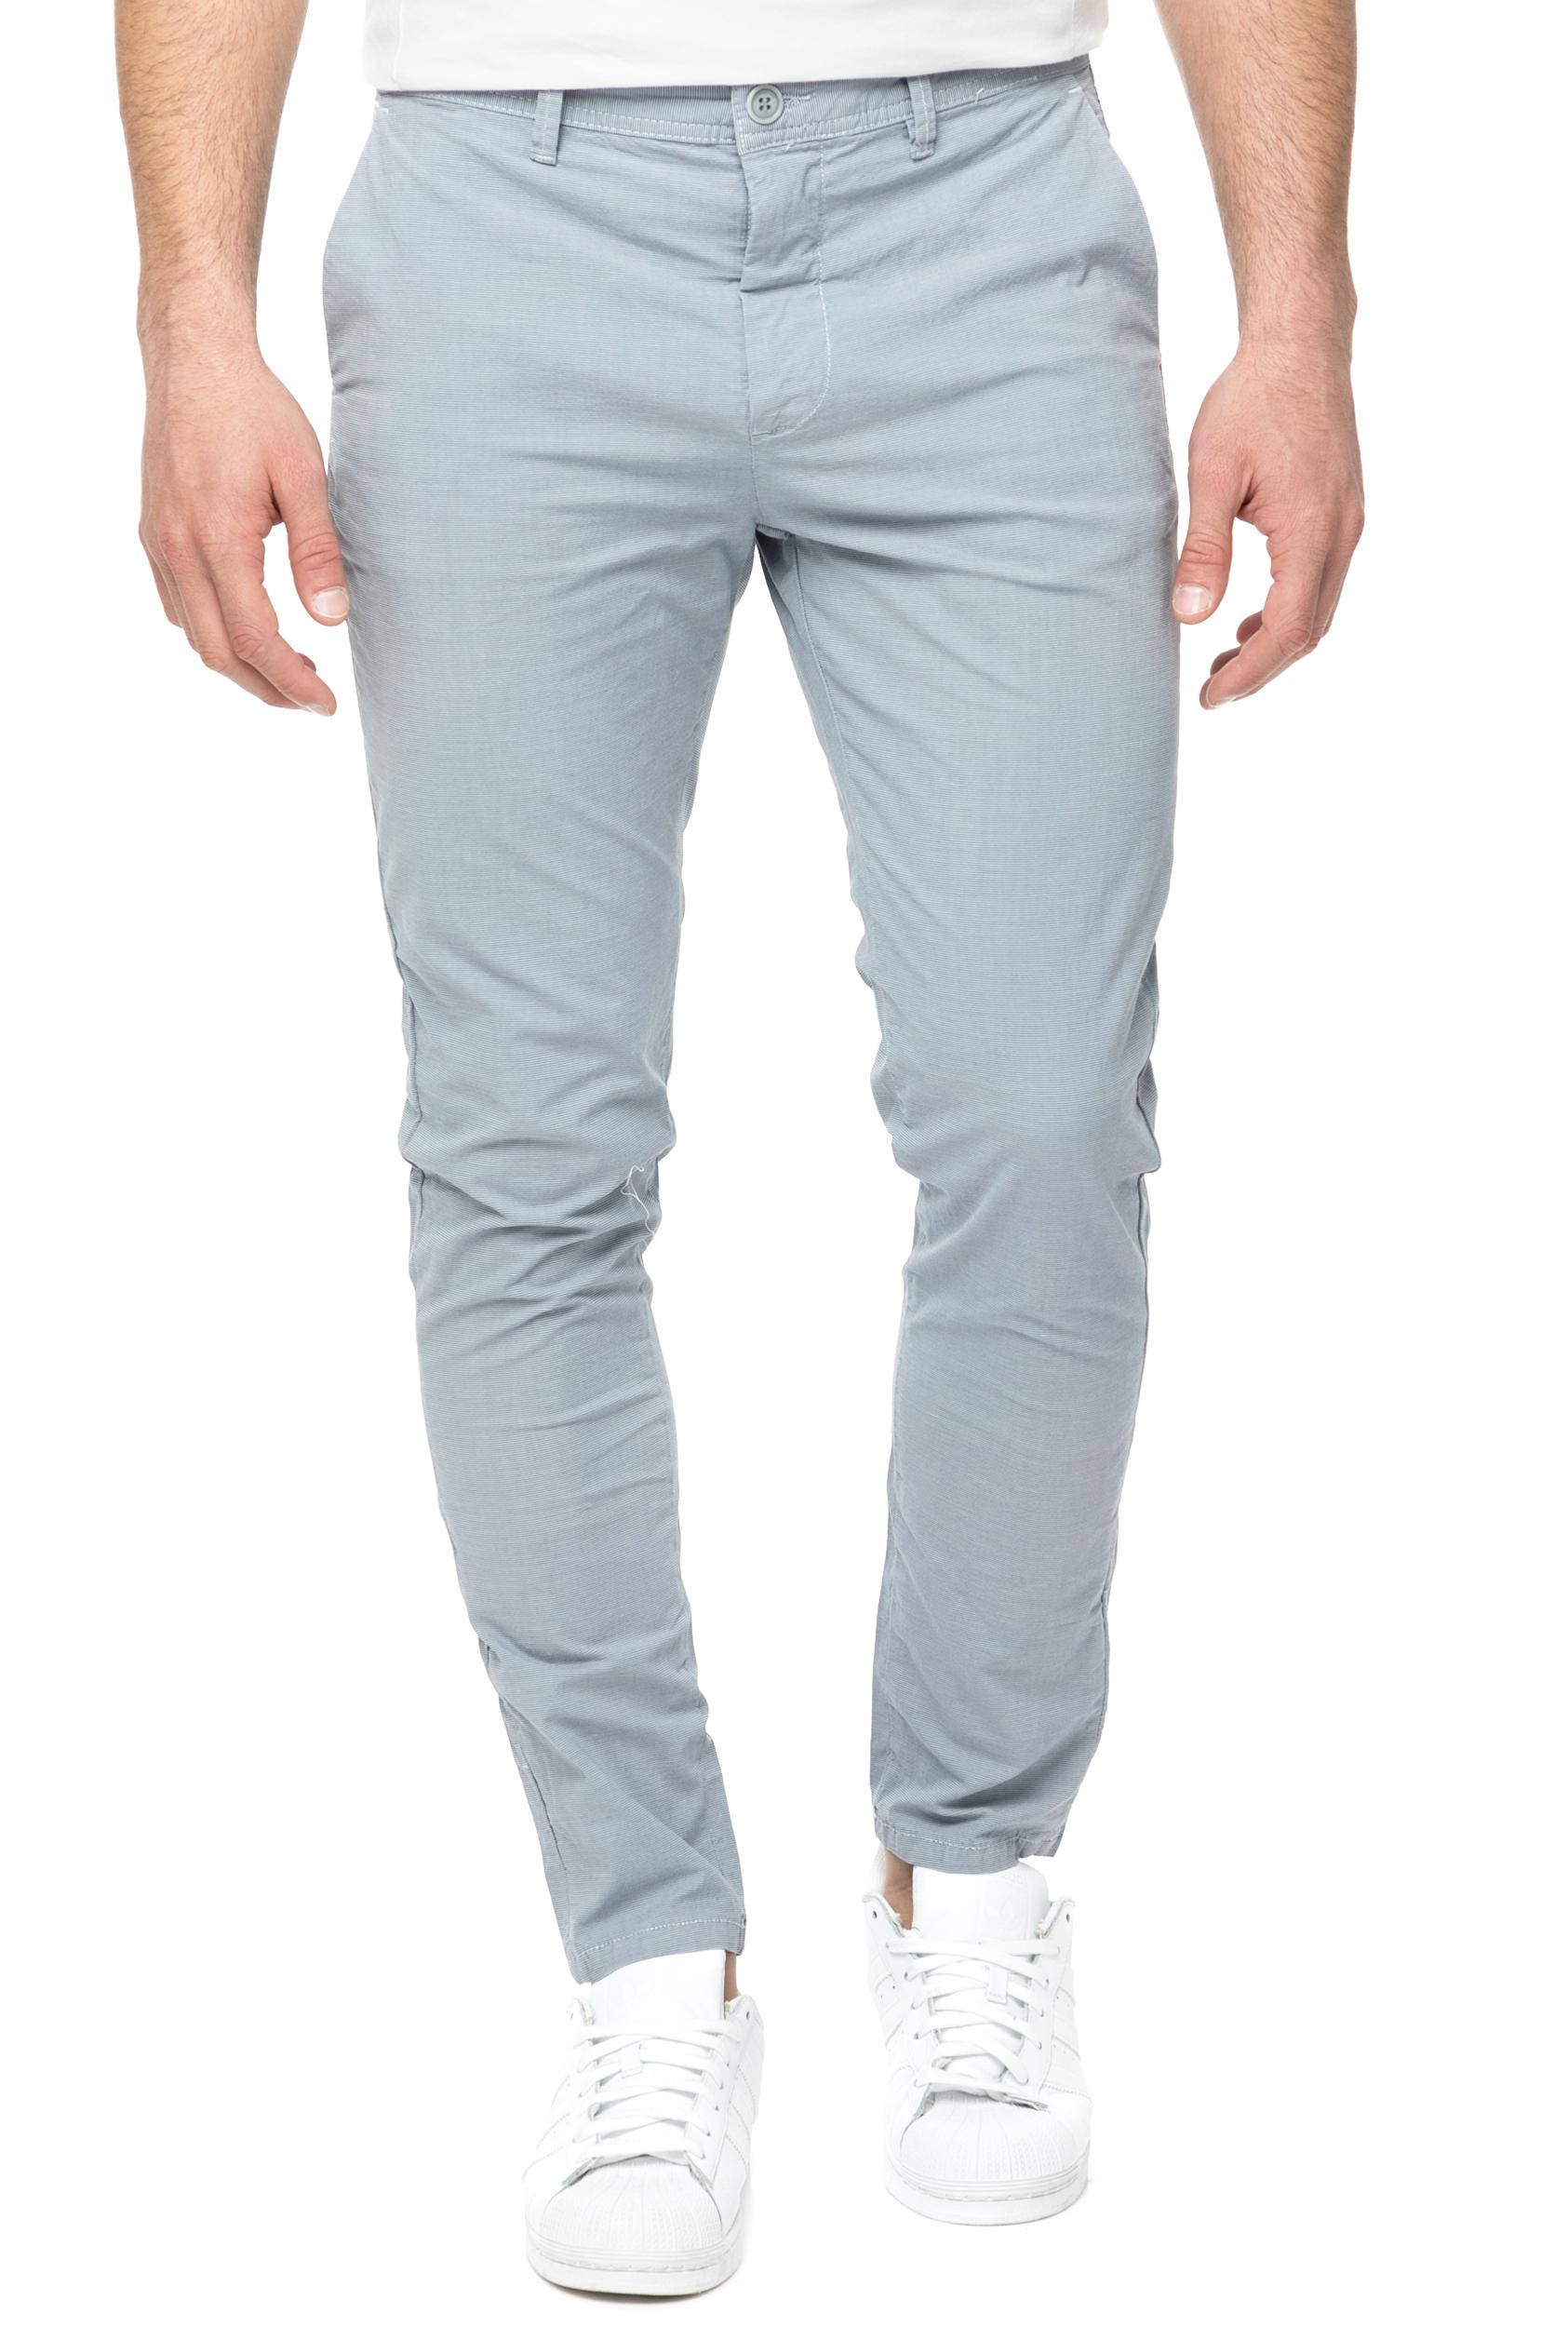 HAMAKI HO - Ανδρικό chino παντελόνι HAMAKI HO γαλάζιο ανδρικά ρούχα παντελόνια chinos